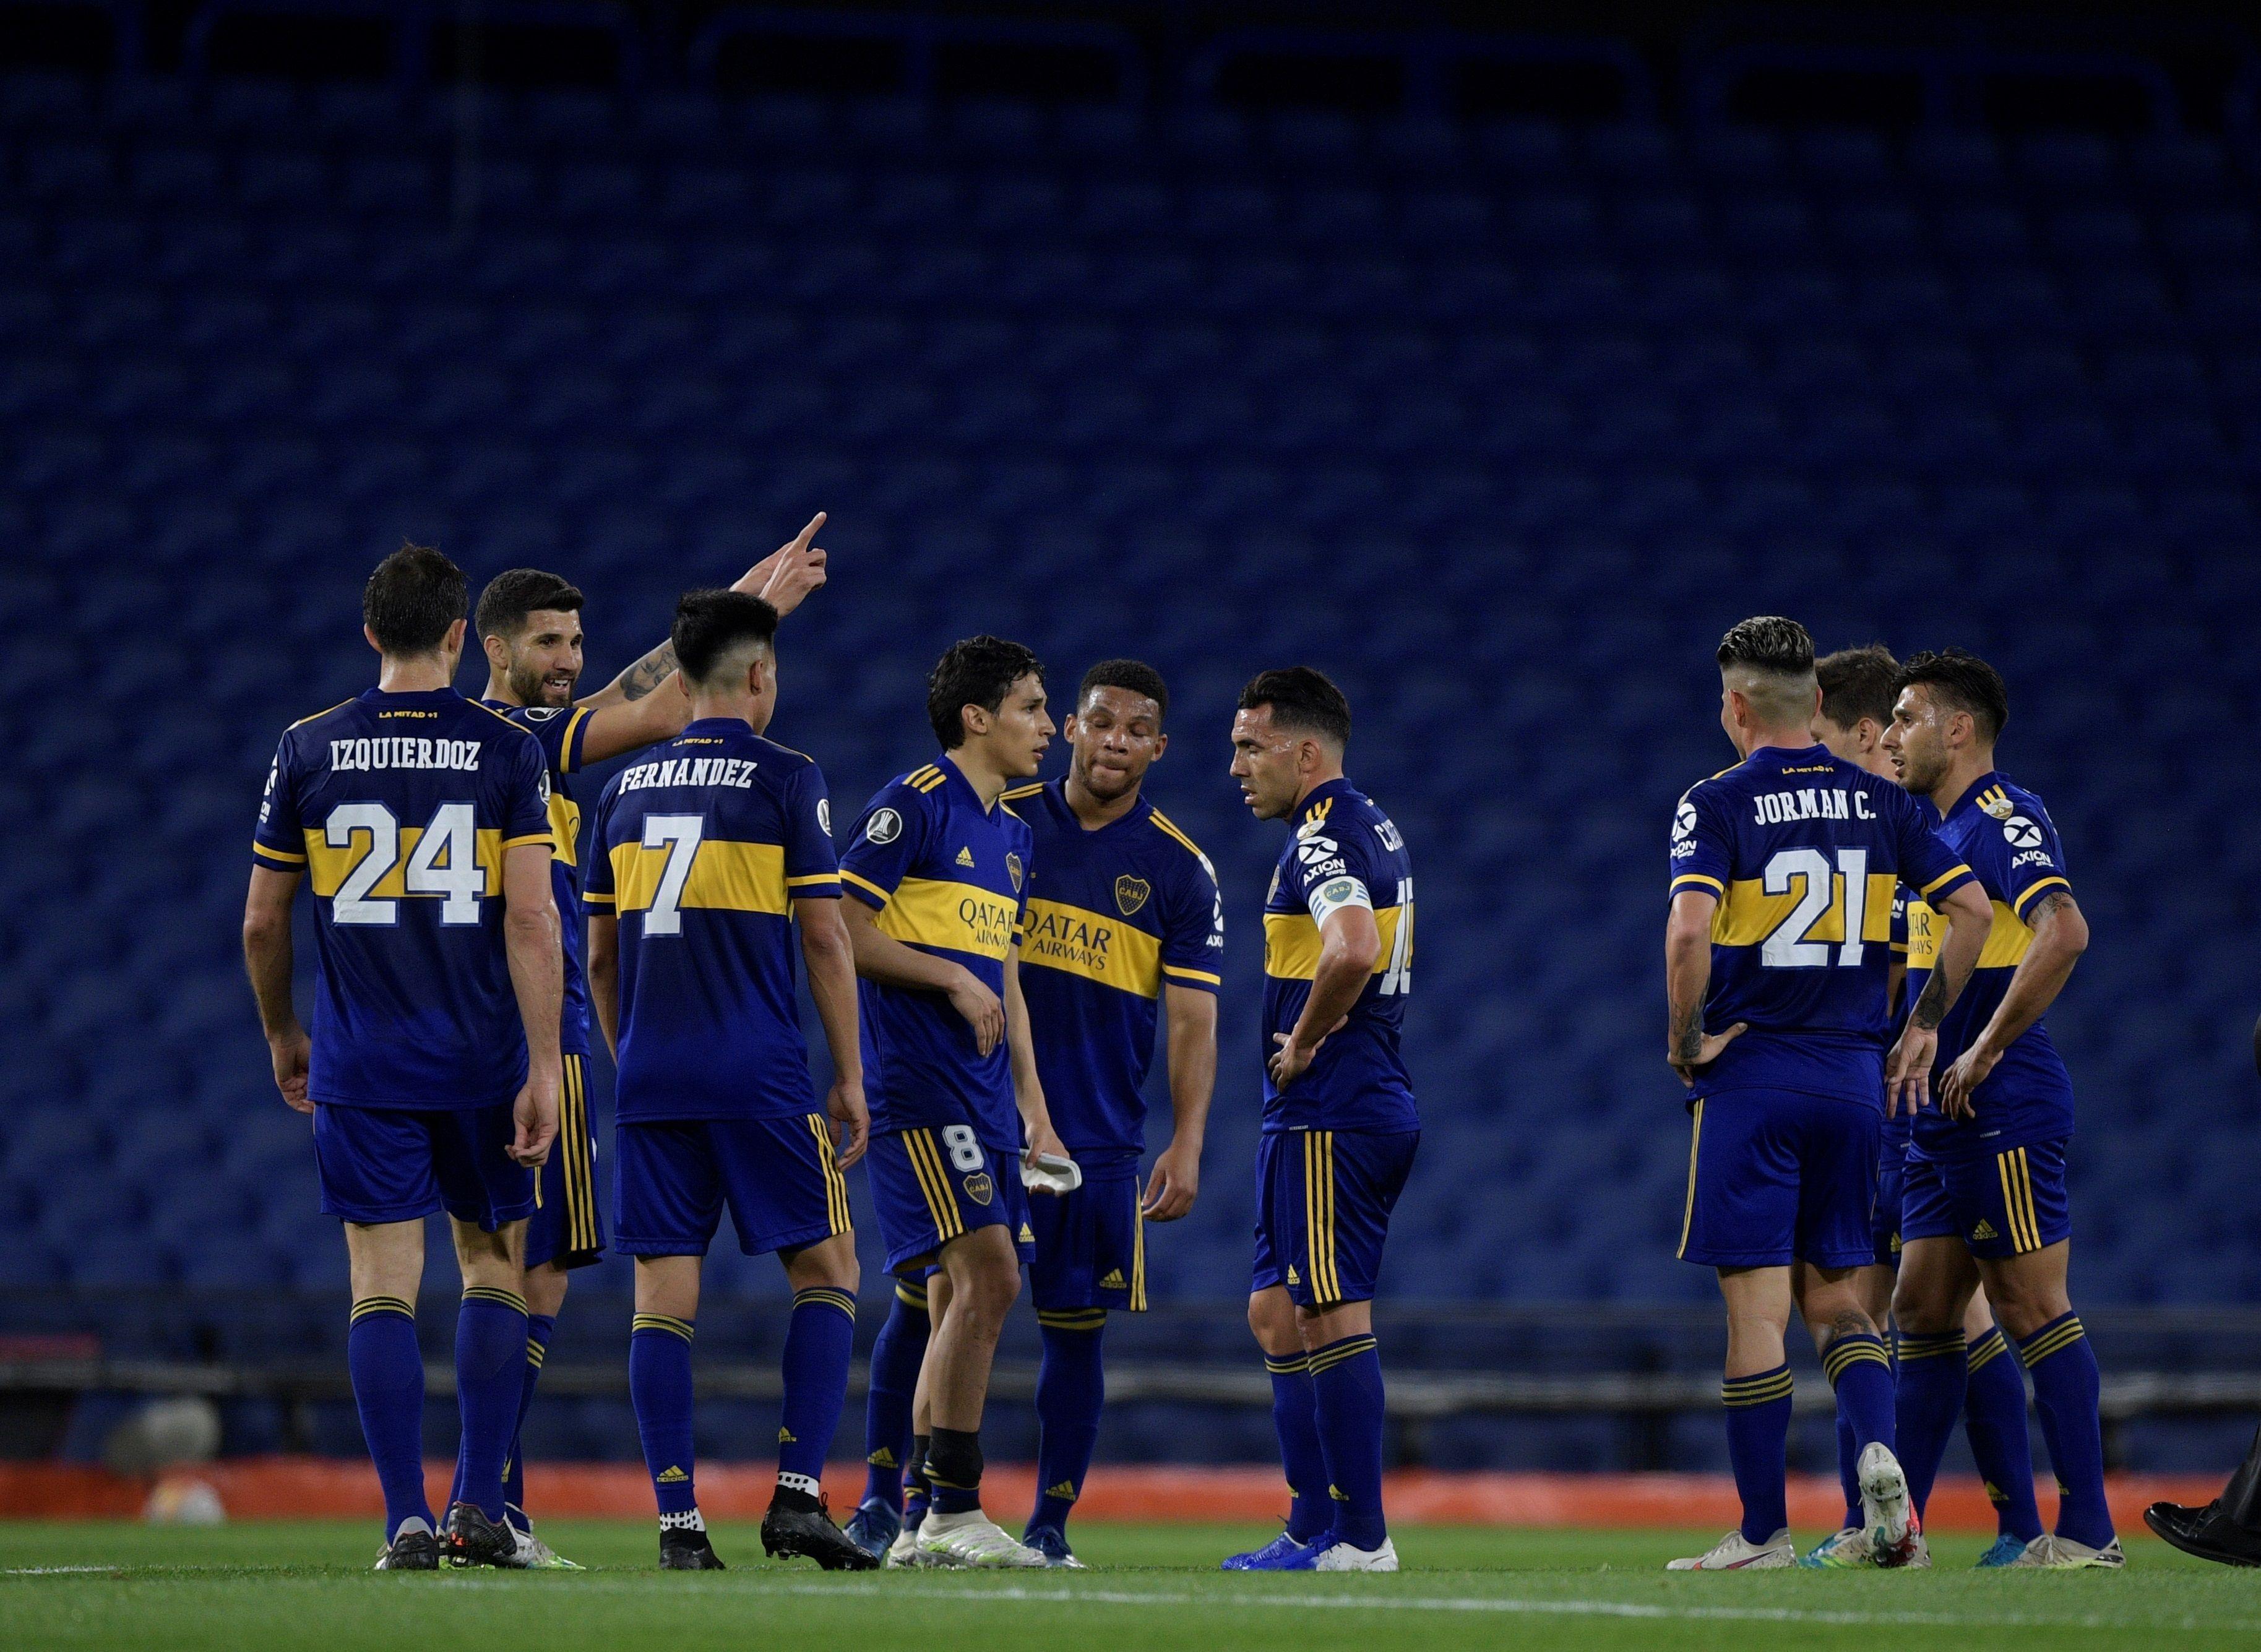 Boca empató con Libertad y se aseguró un boleto a los octavos de final de la Copa Libertadores (EFE/Juan Mabromata)